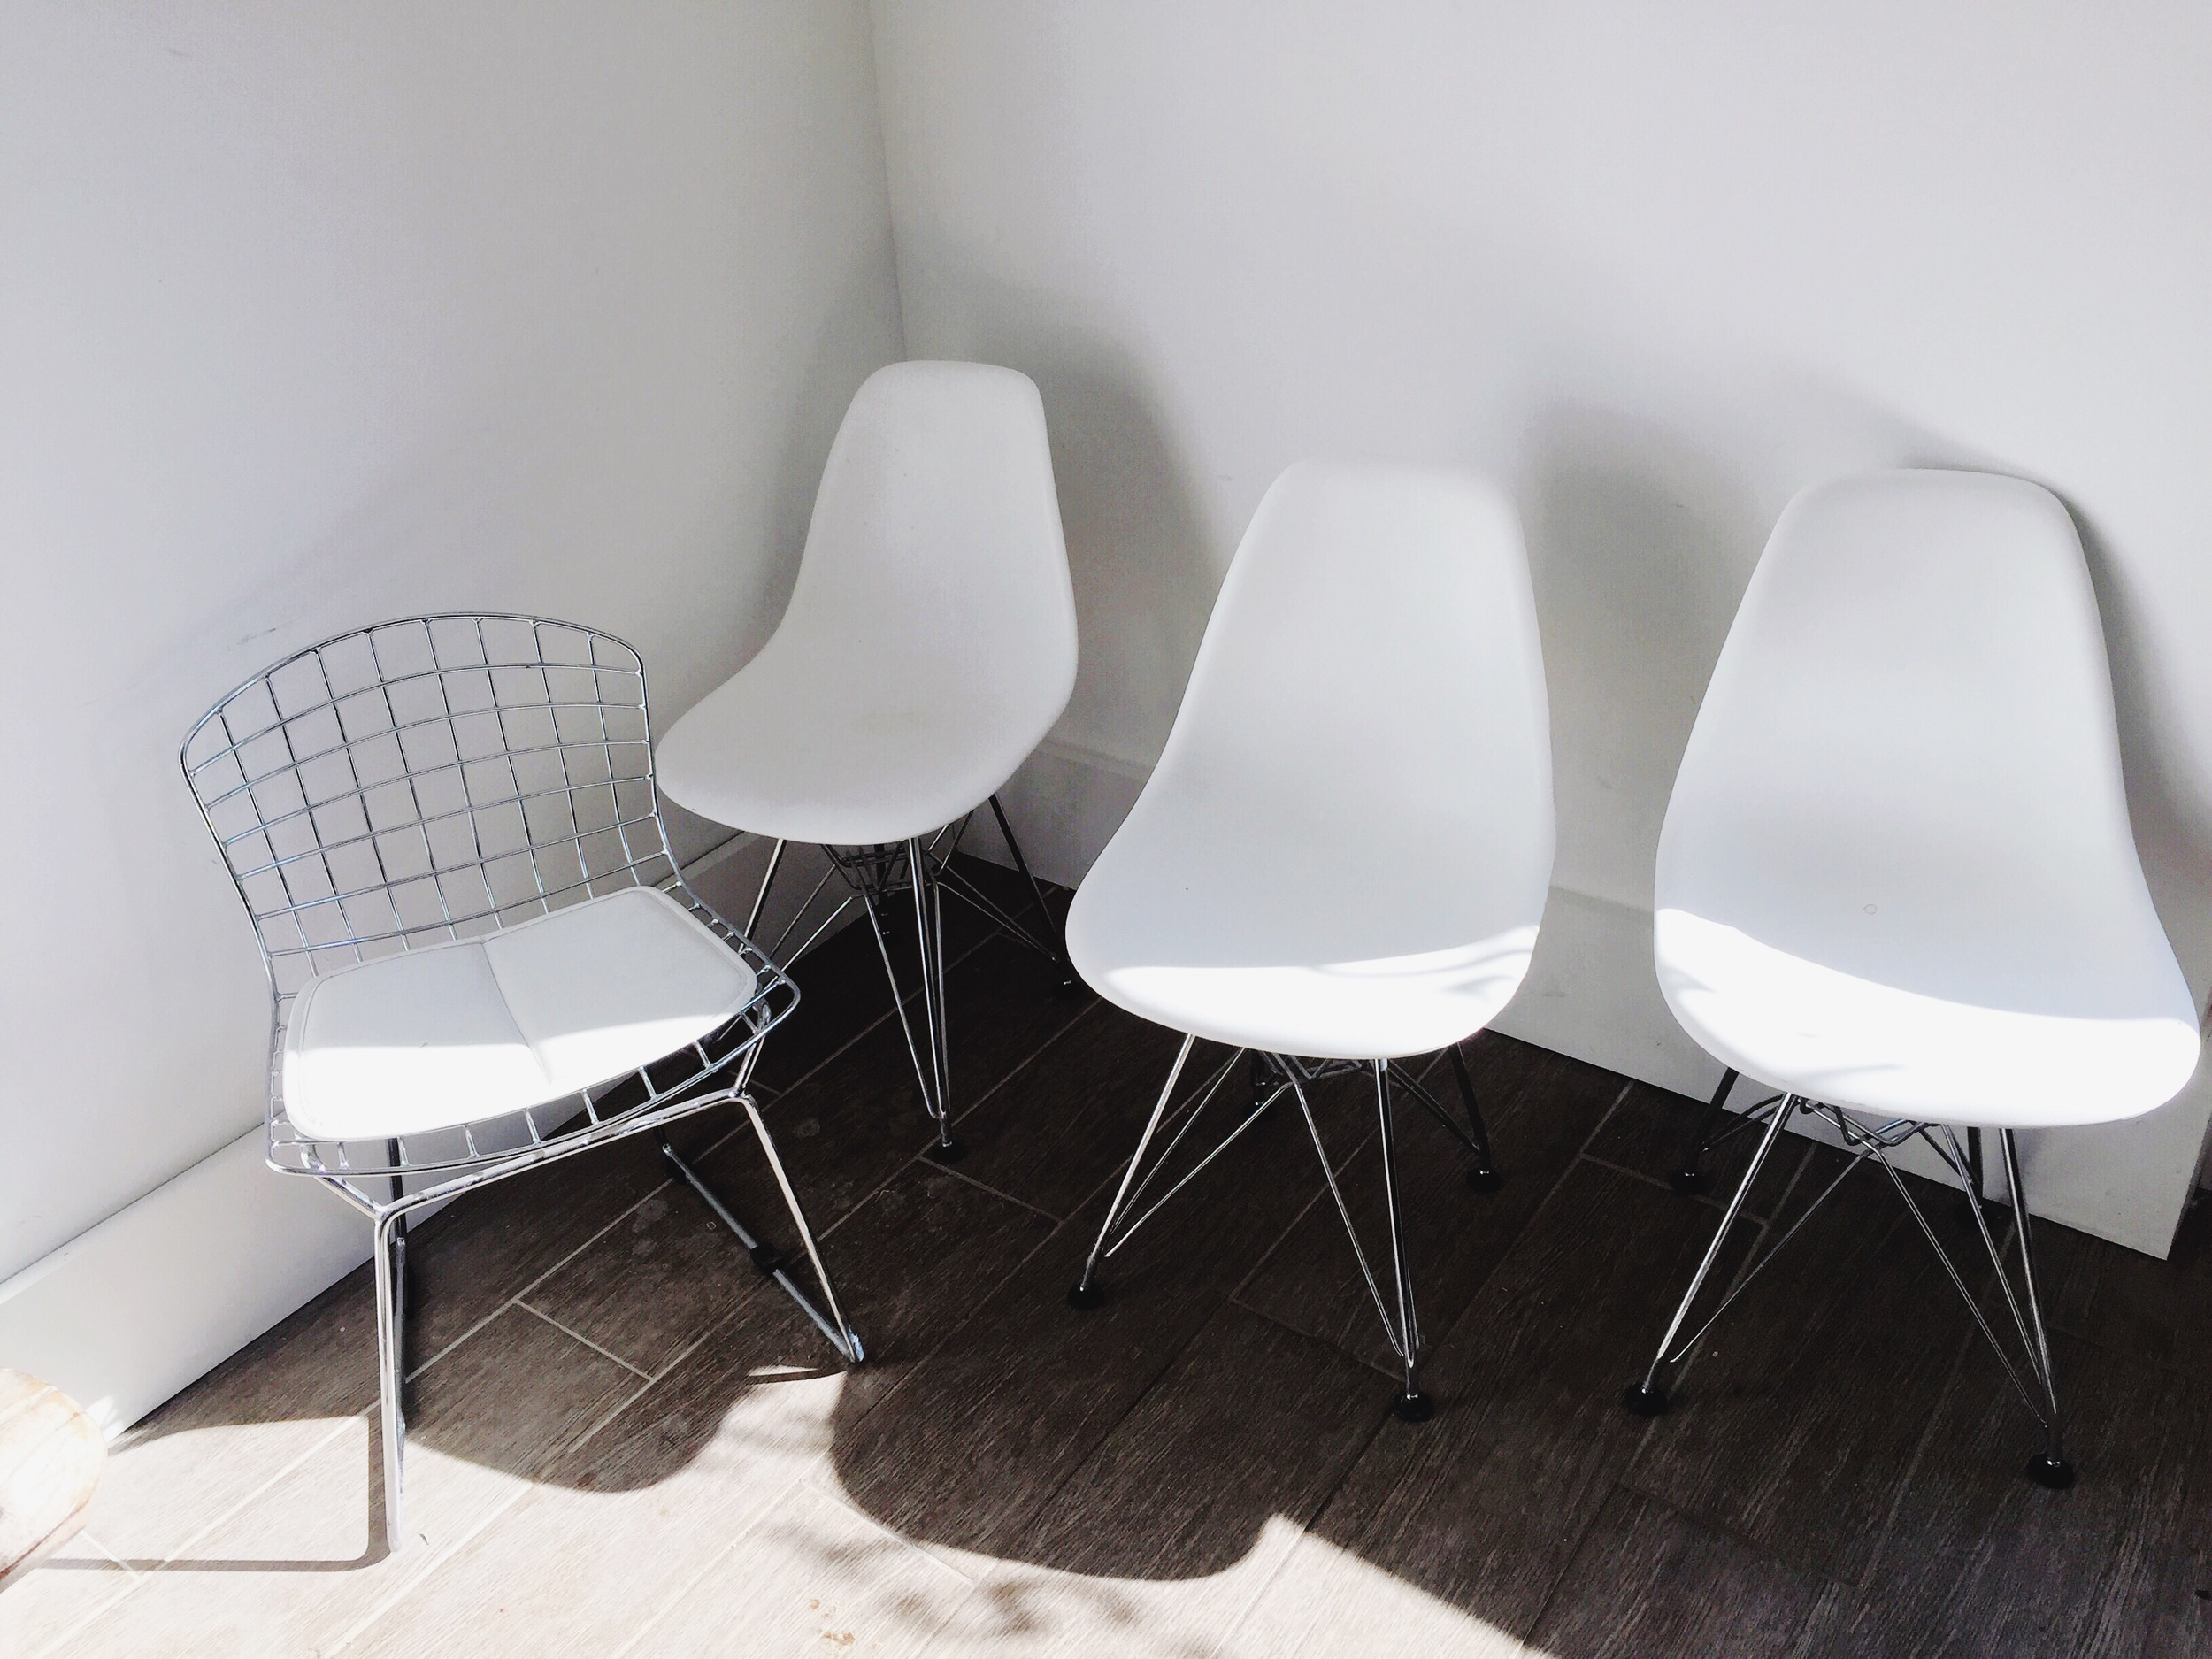 Miniature designer chairs at  Dark Horse Espresso Bar .